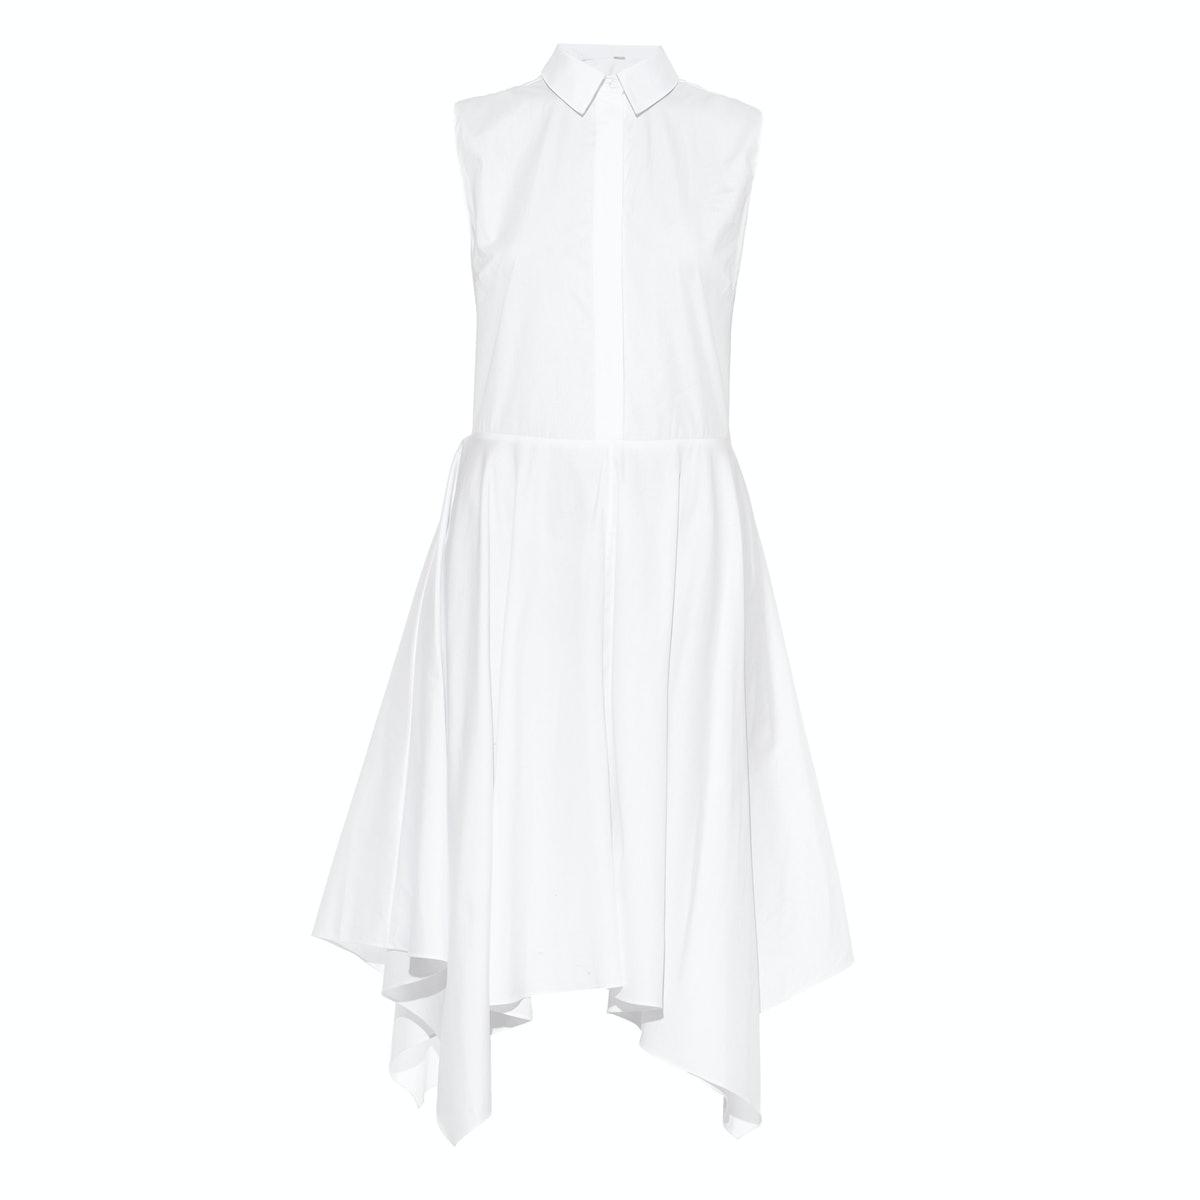 Adam Lippes dress